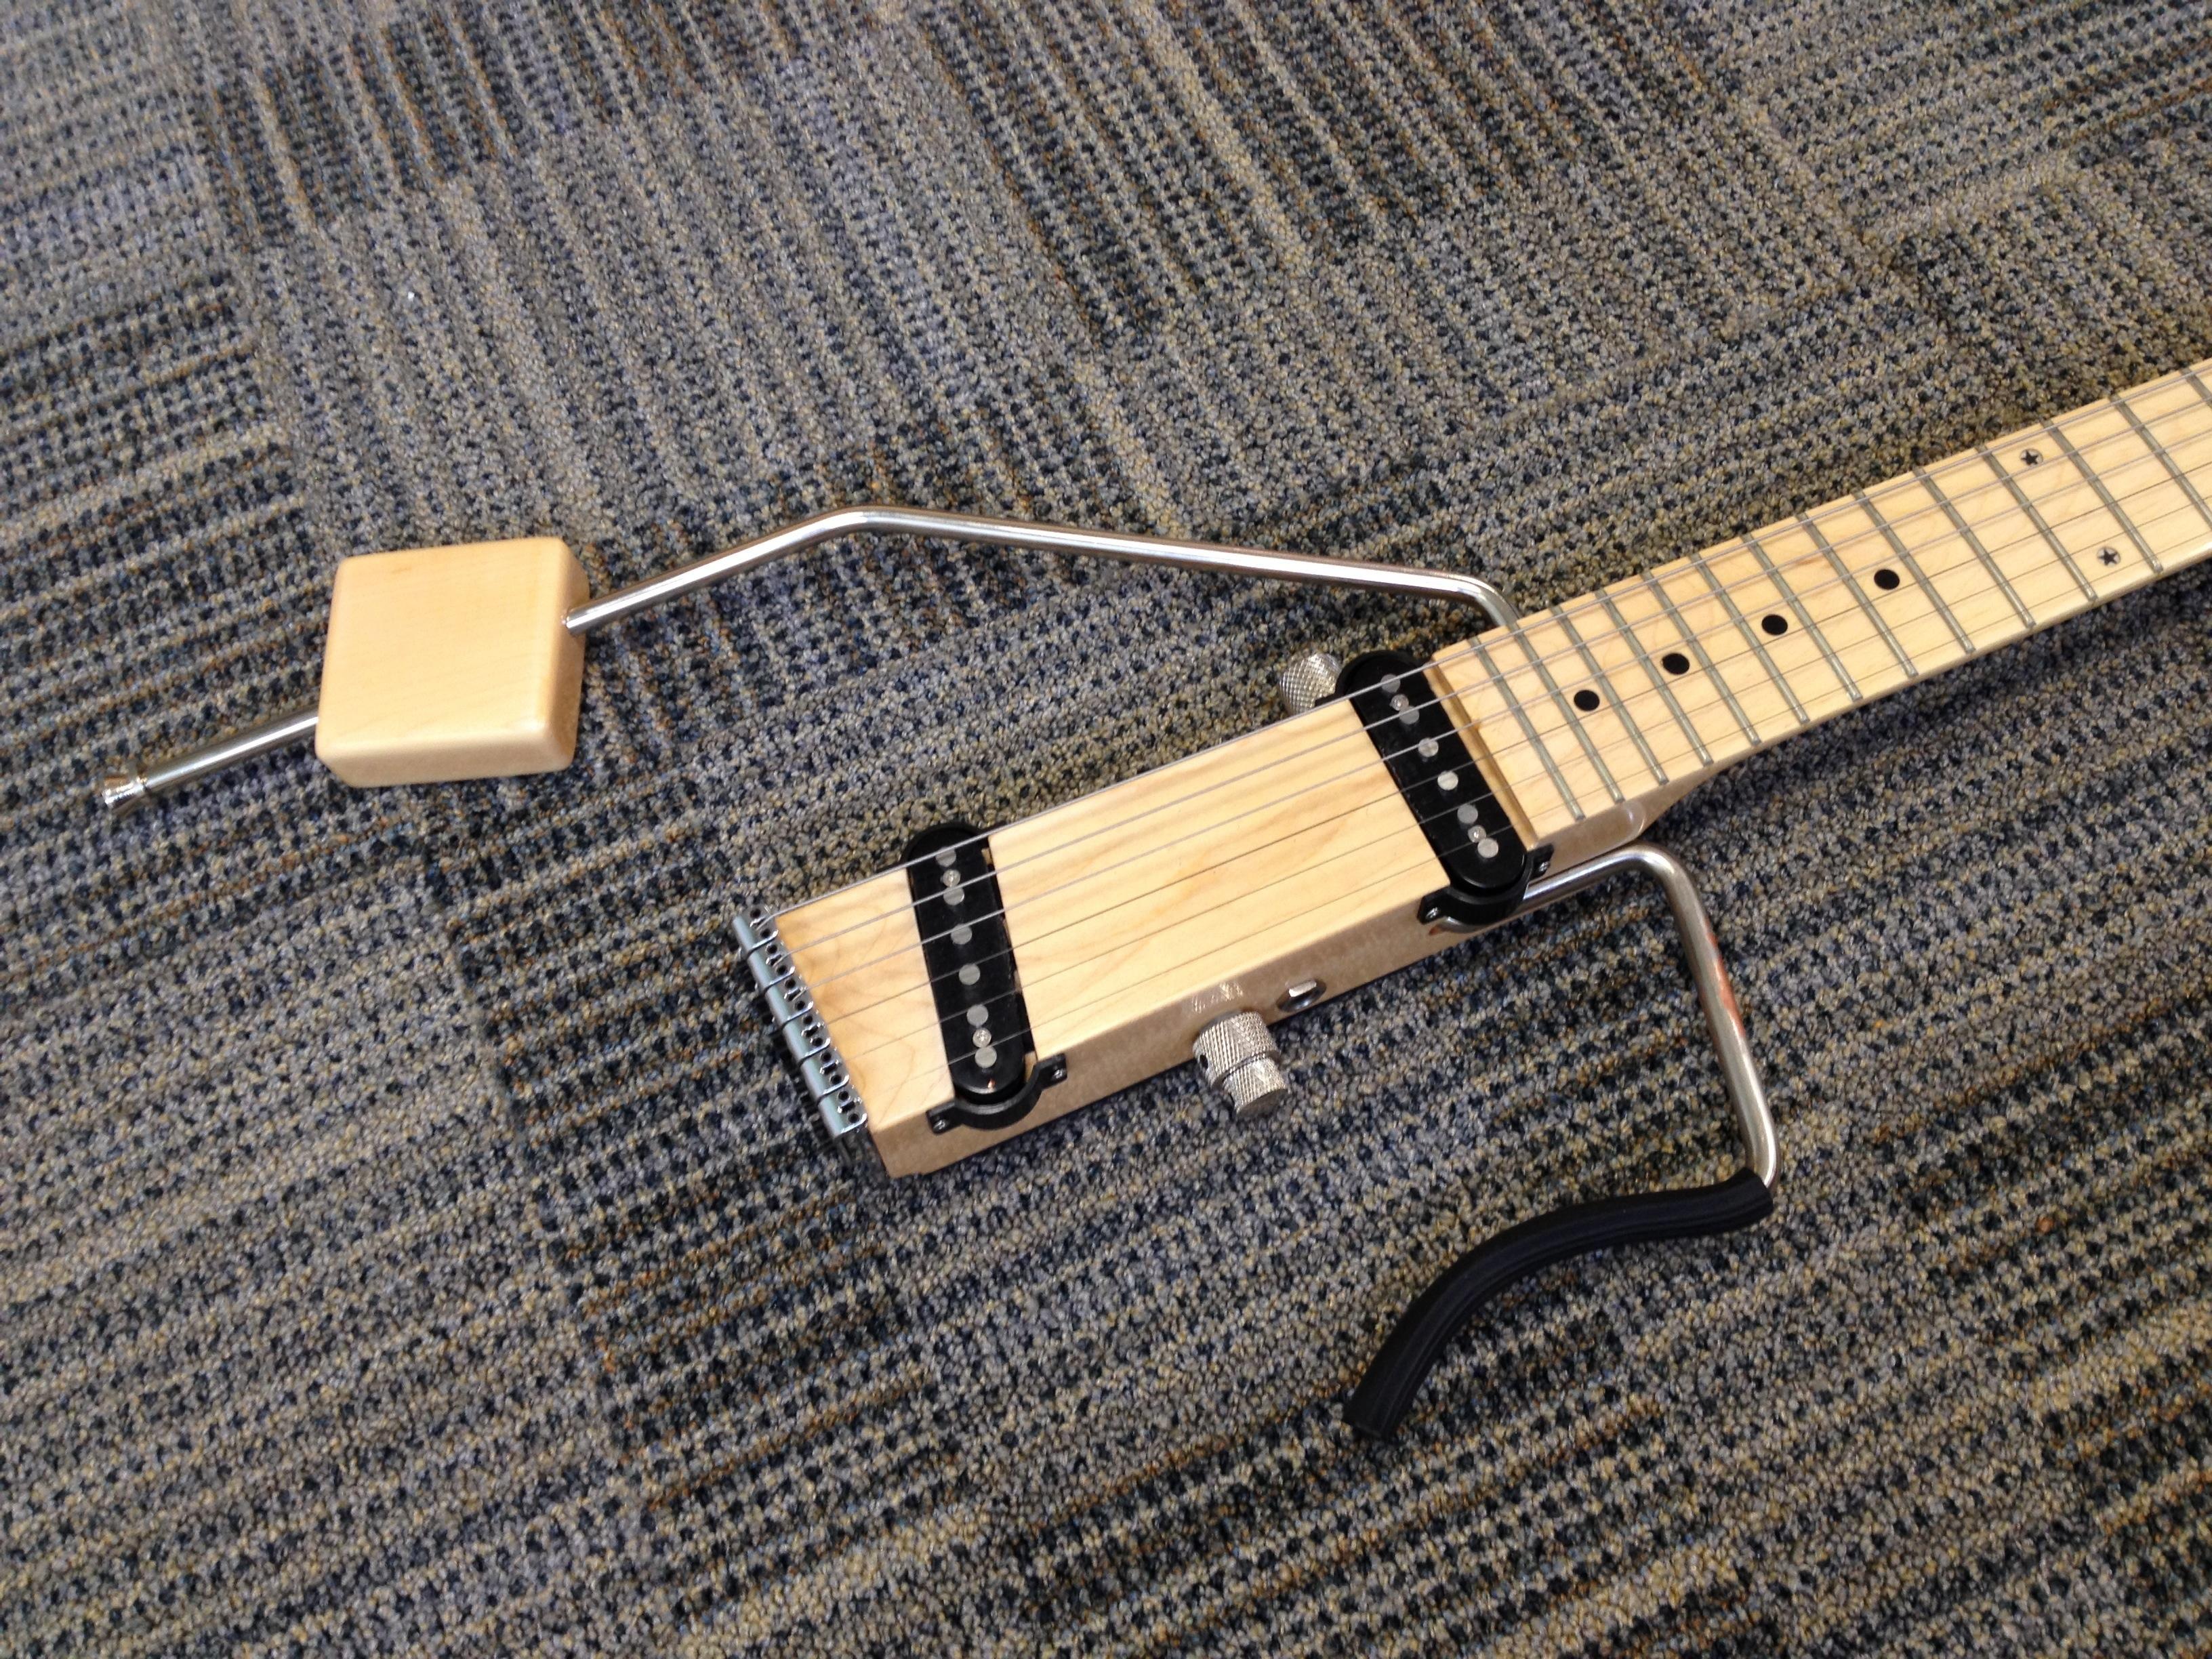 Herley Benton Guitars